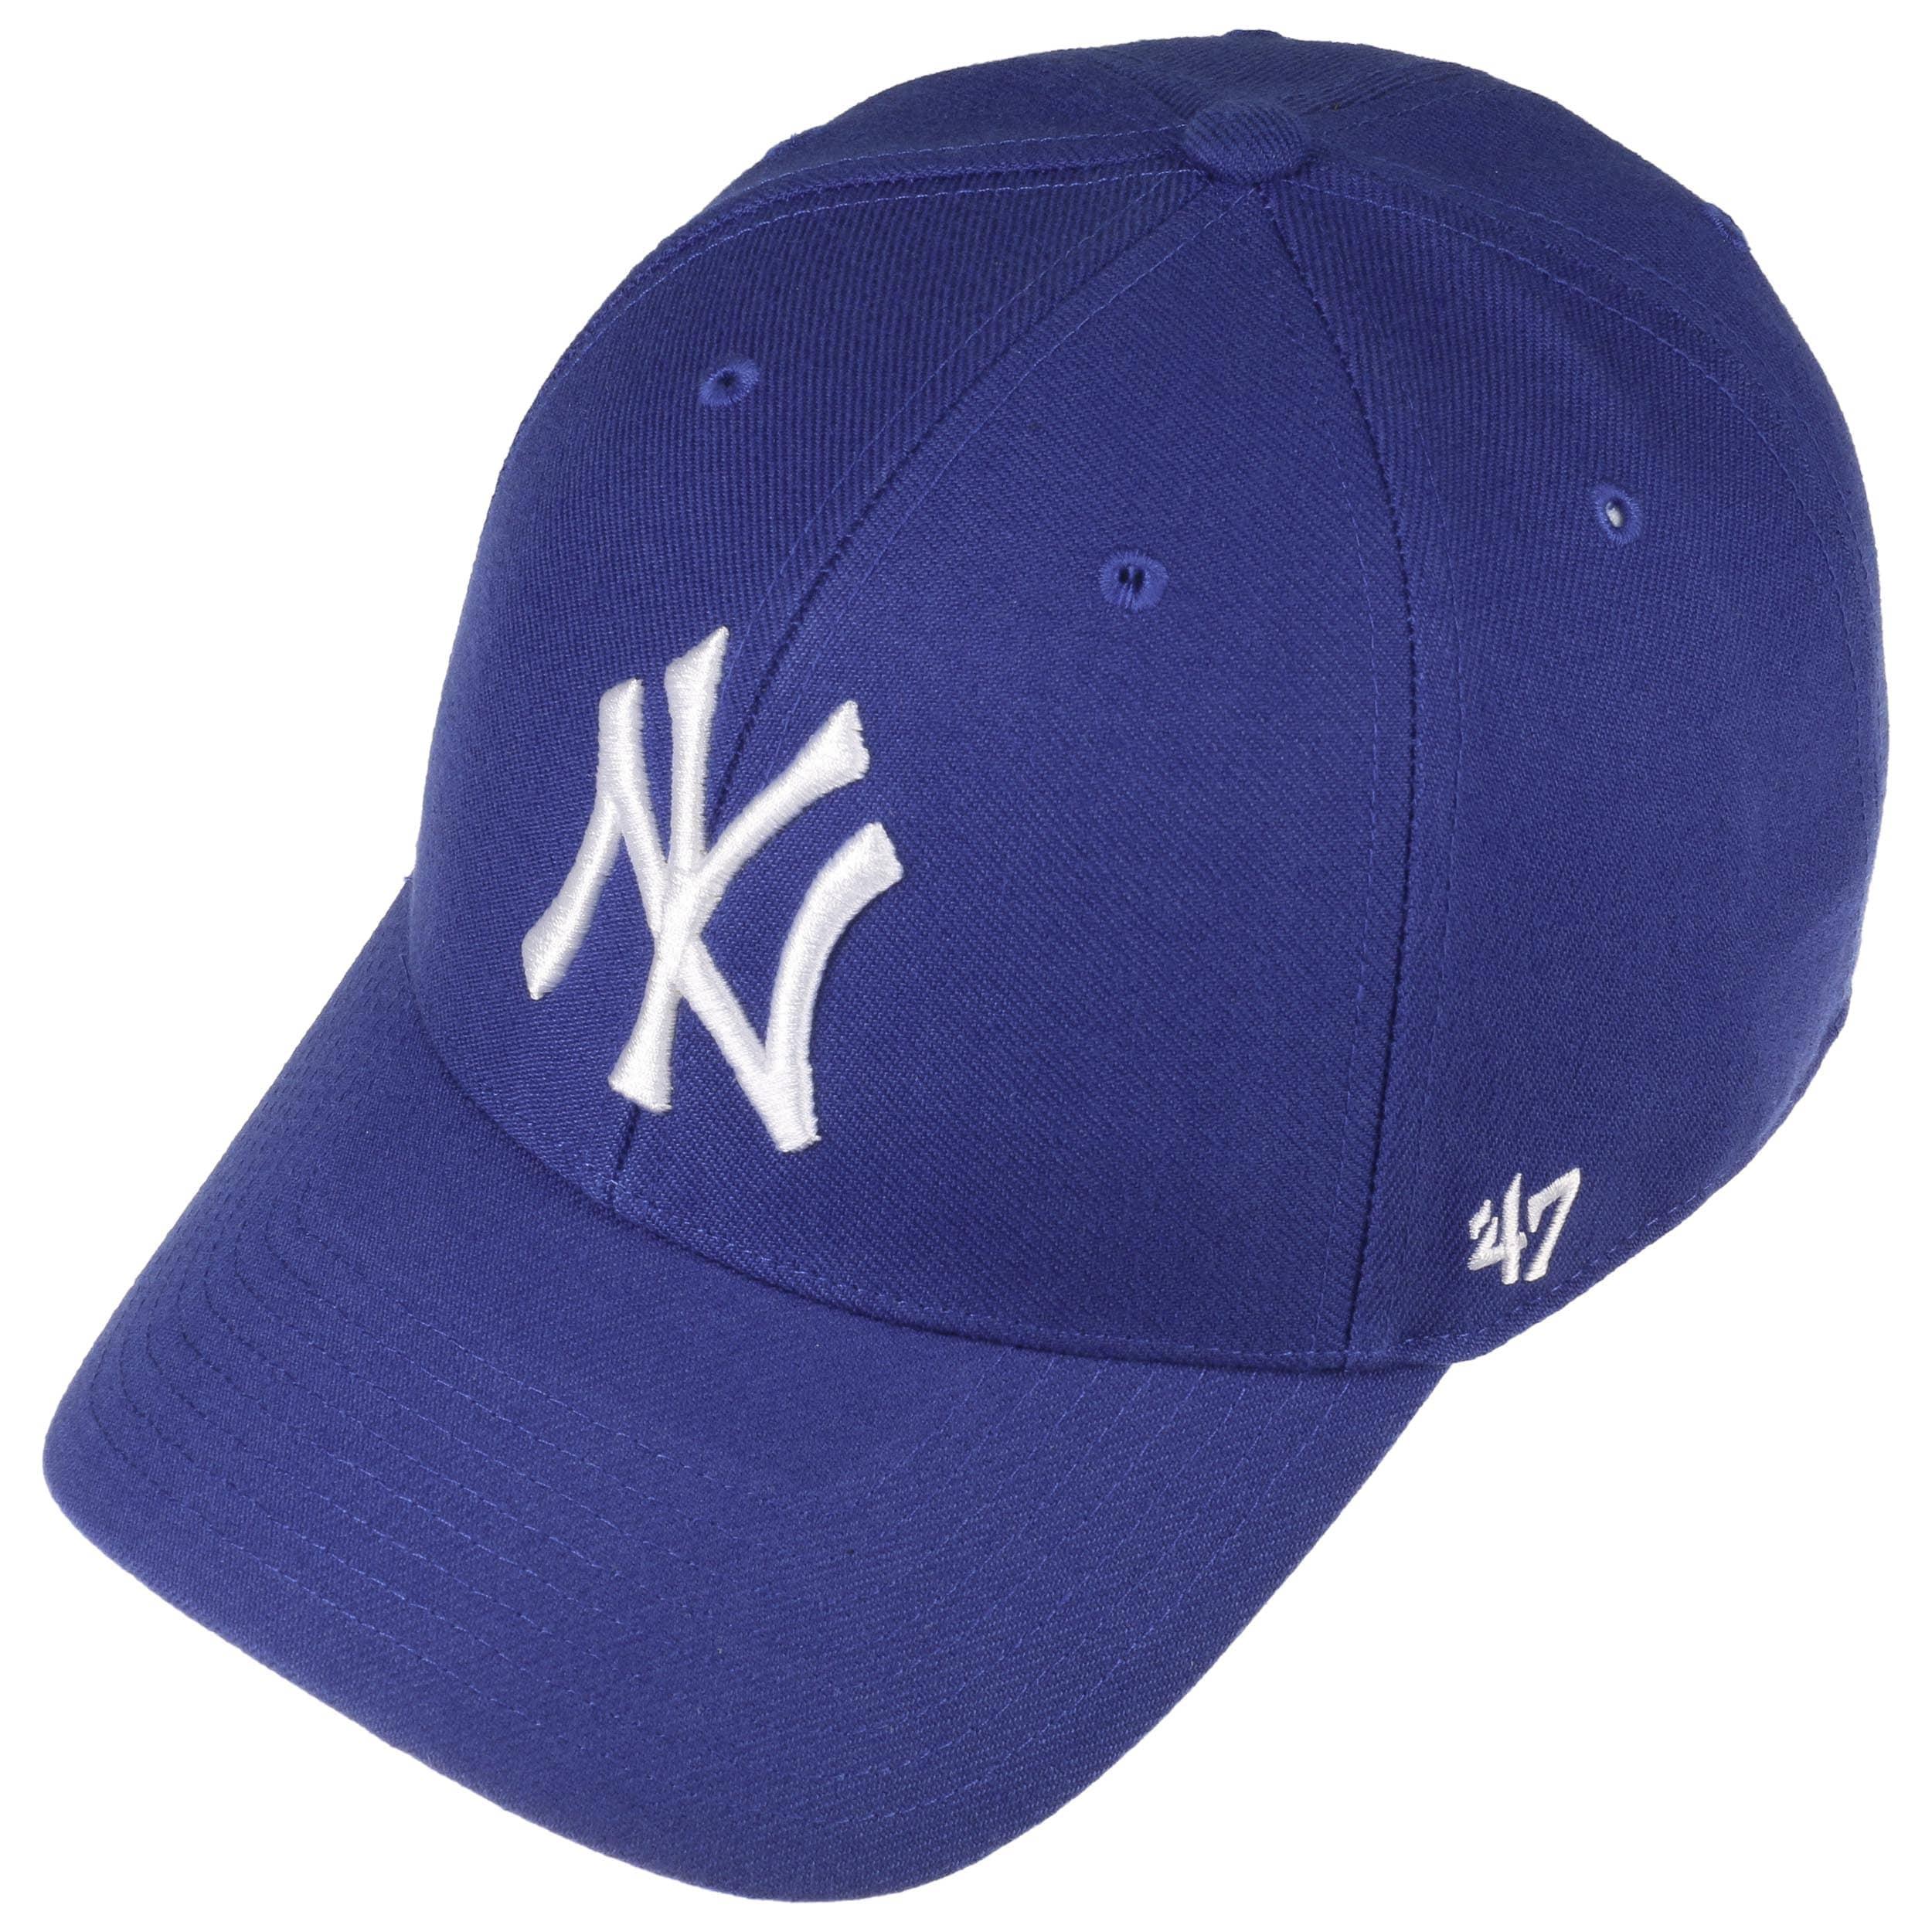 Gorra MVP Snapback Yankees by 47 Brand - Gorras - sombreroshop.es a25d2f00d4e